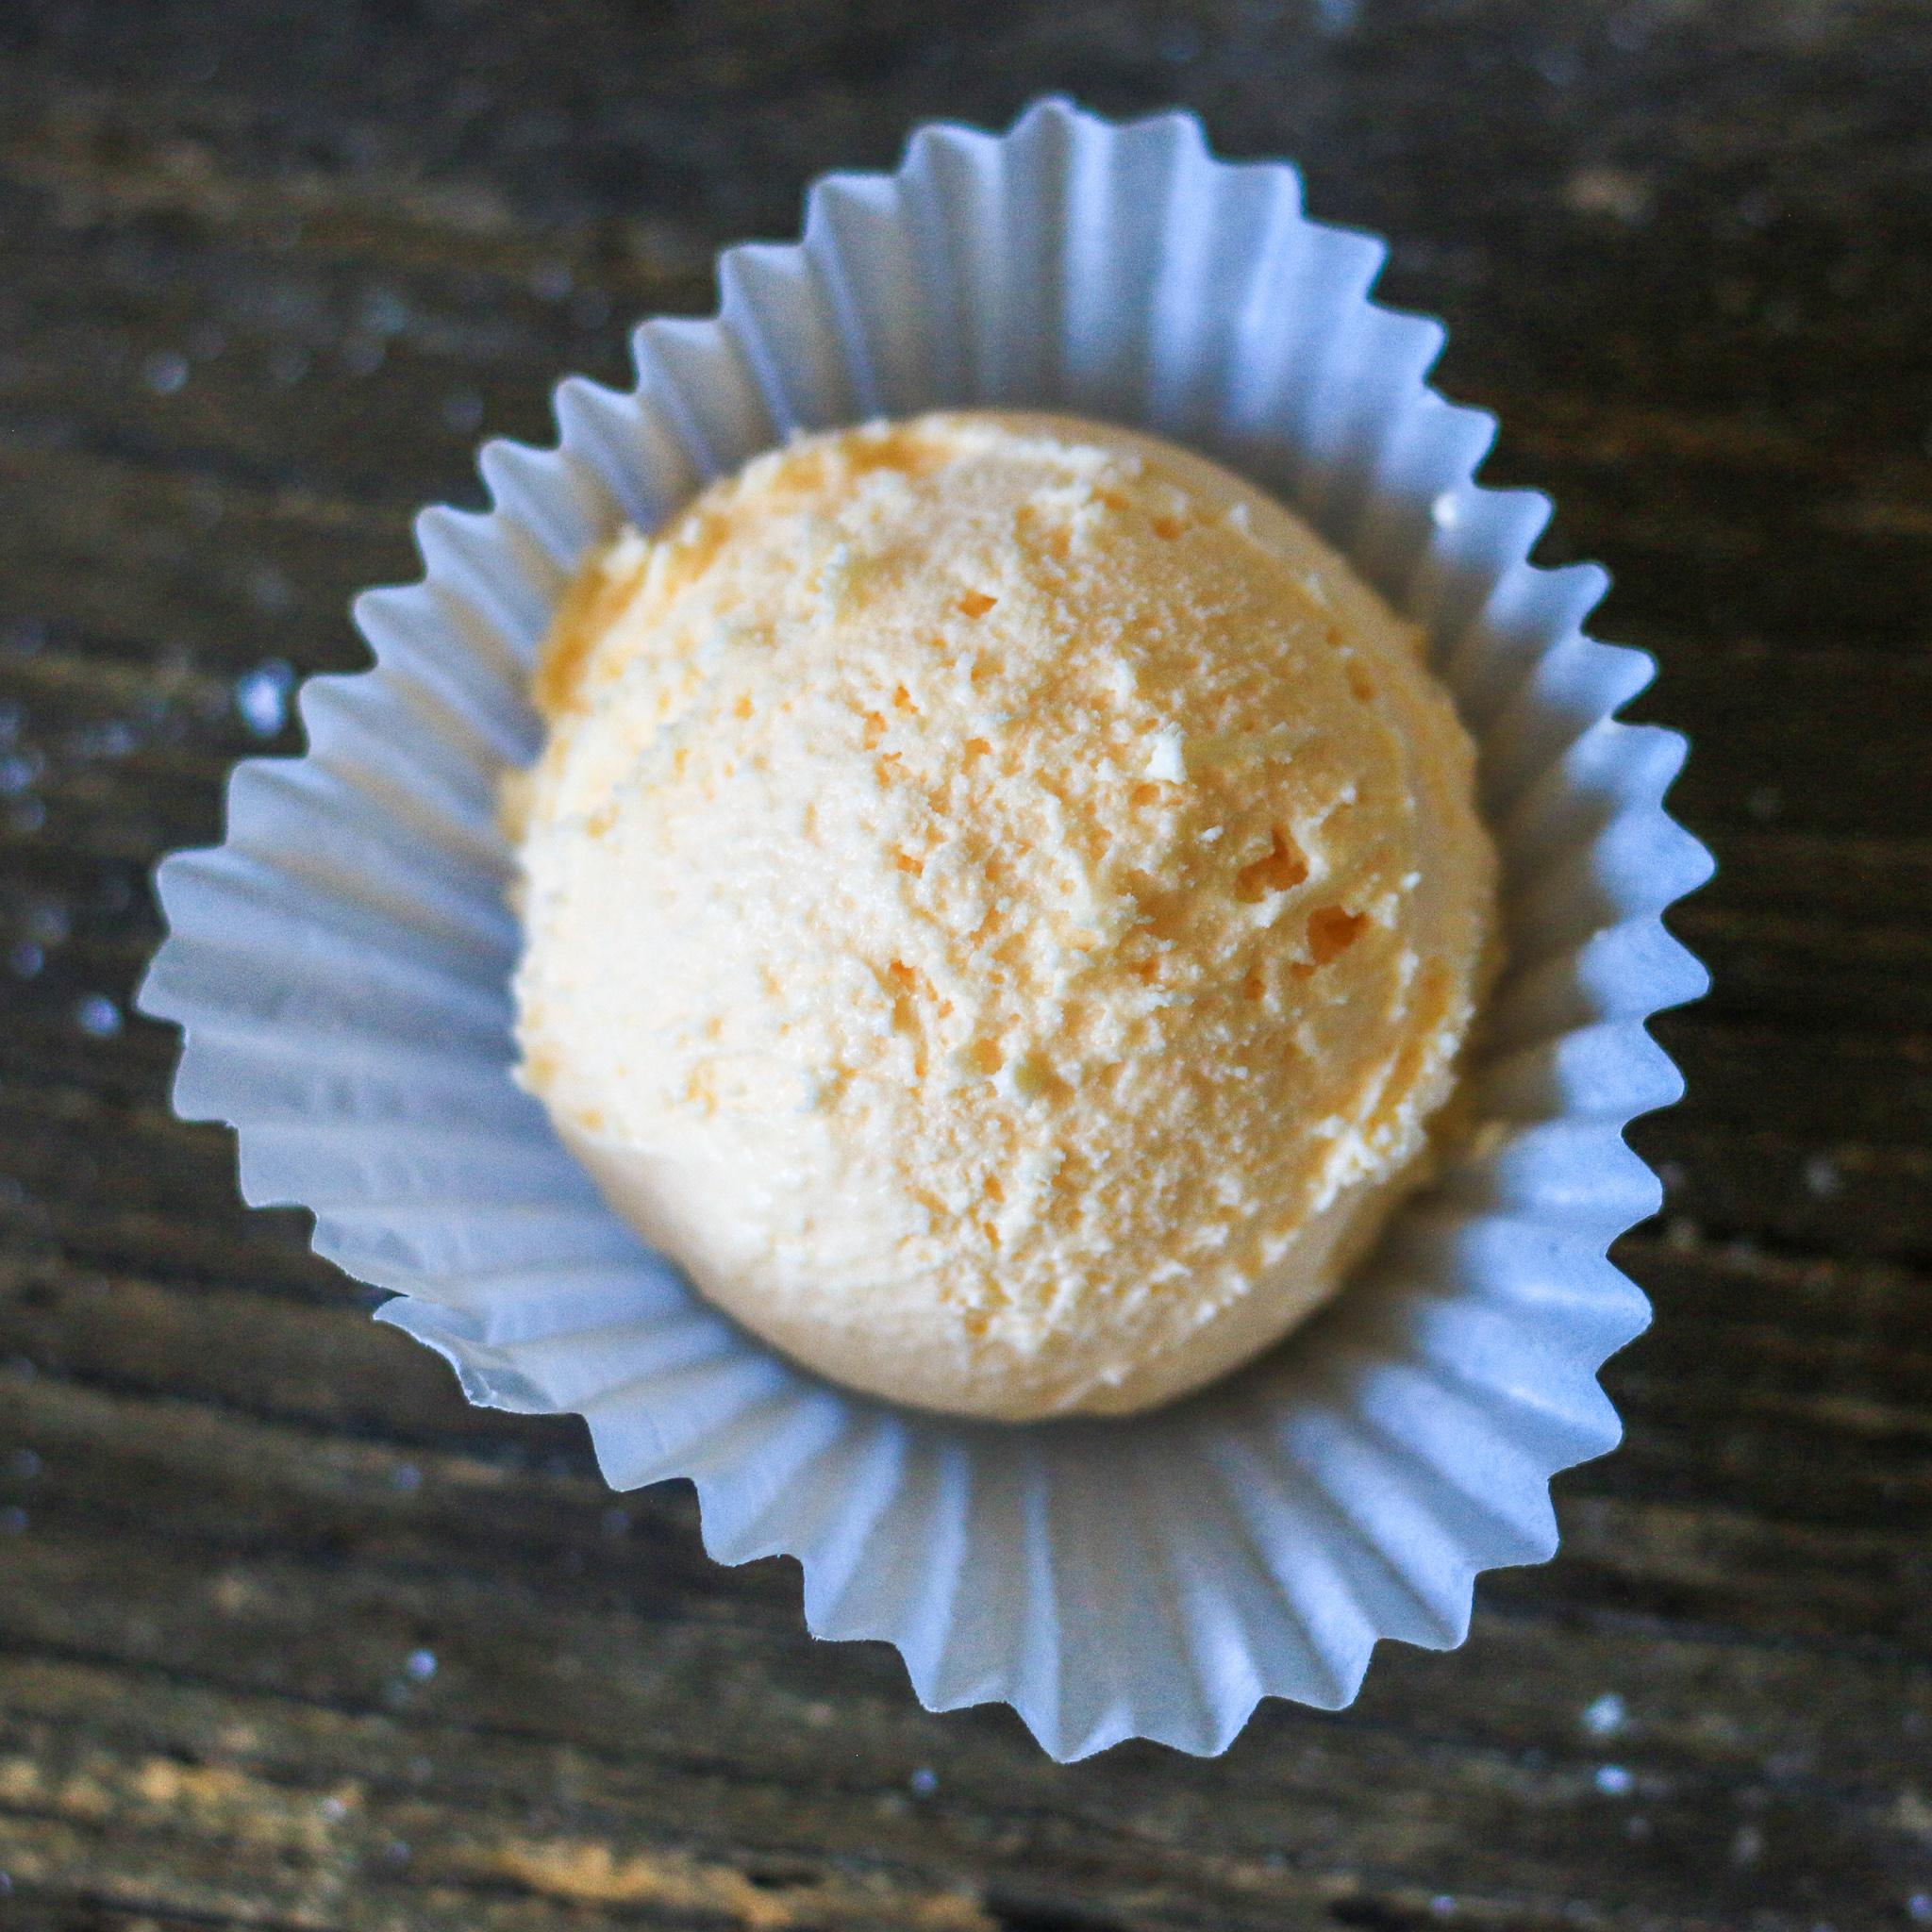 Ice Cream Scoop in Cupcake Liner